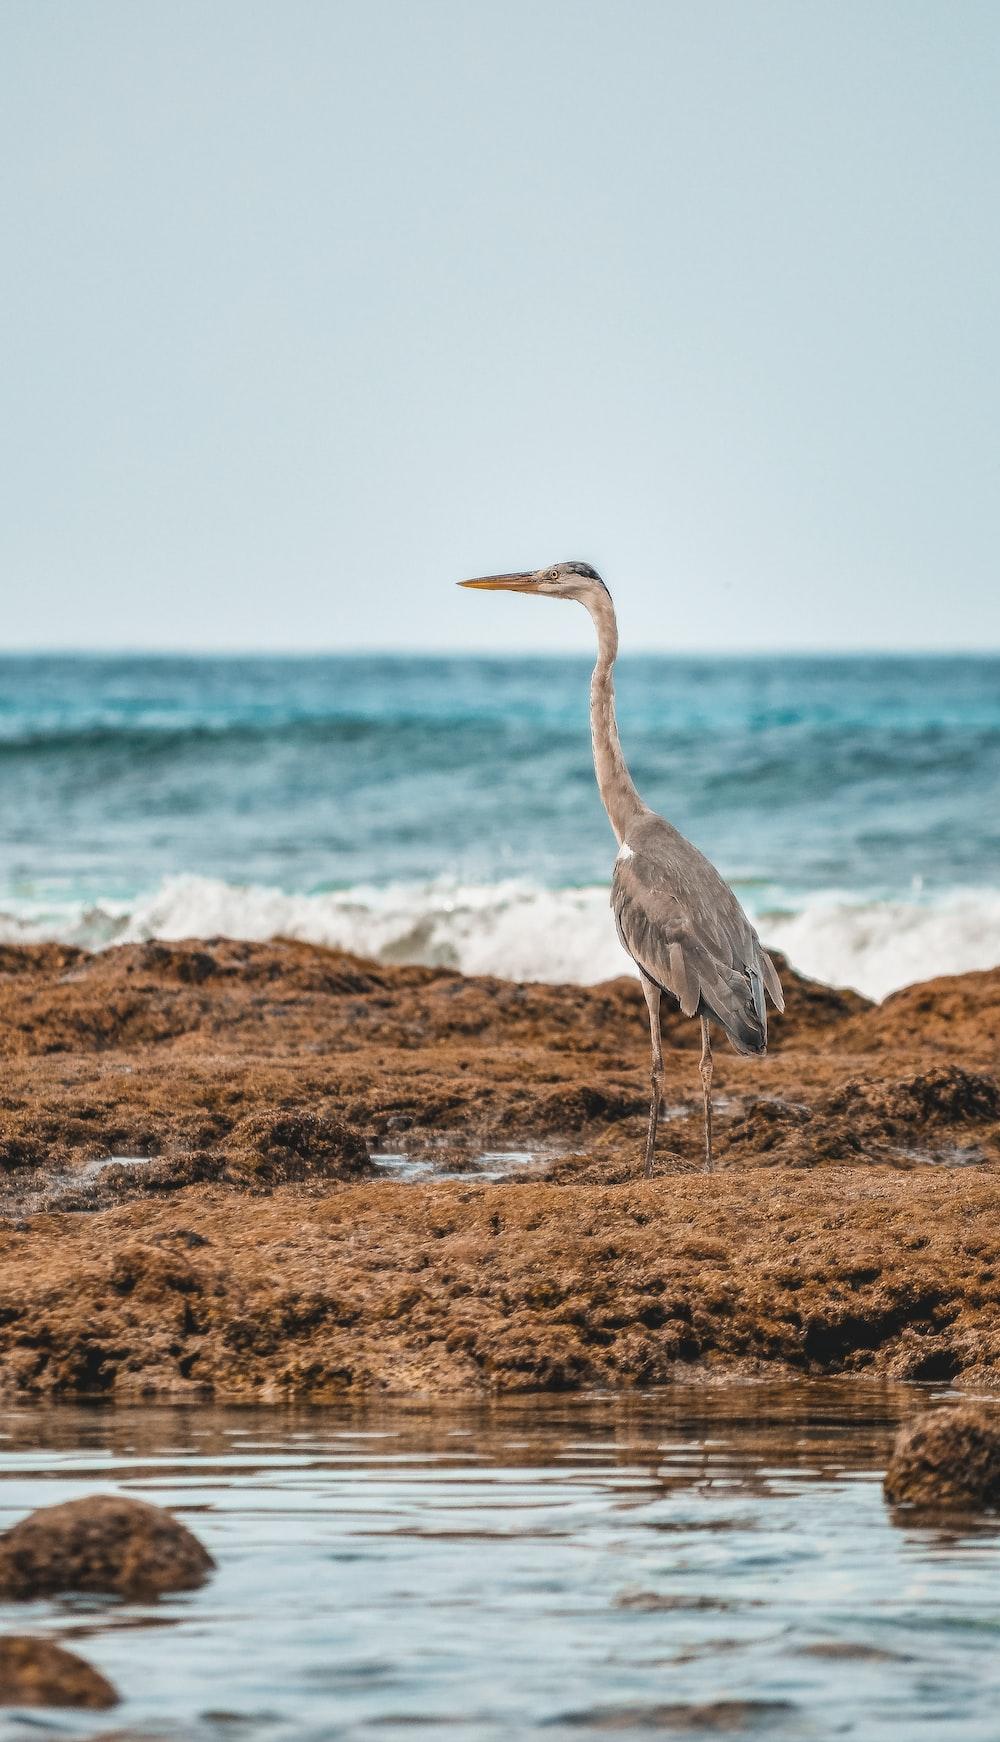 grey heron on brown field near sea during daytime